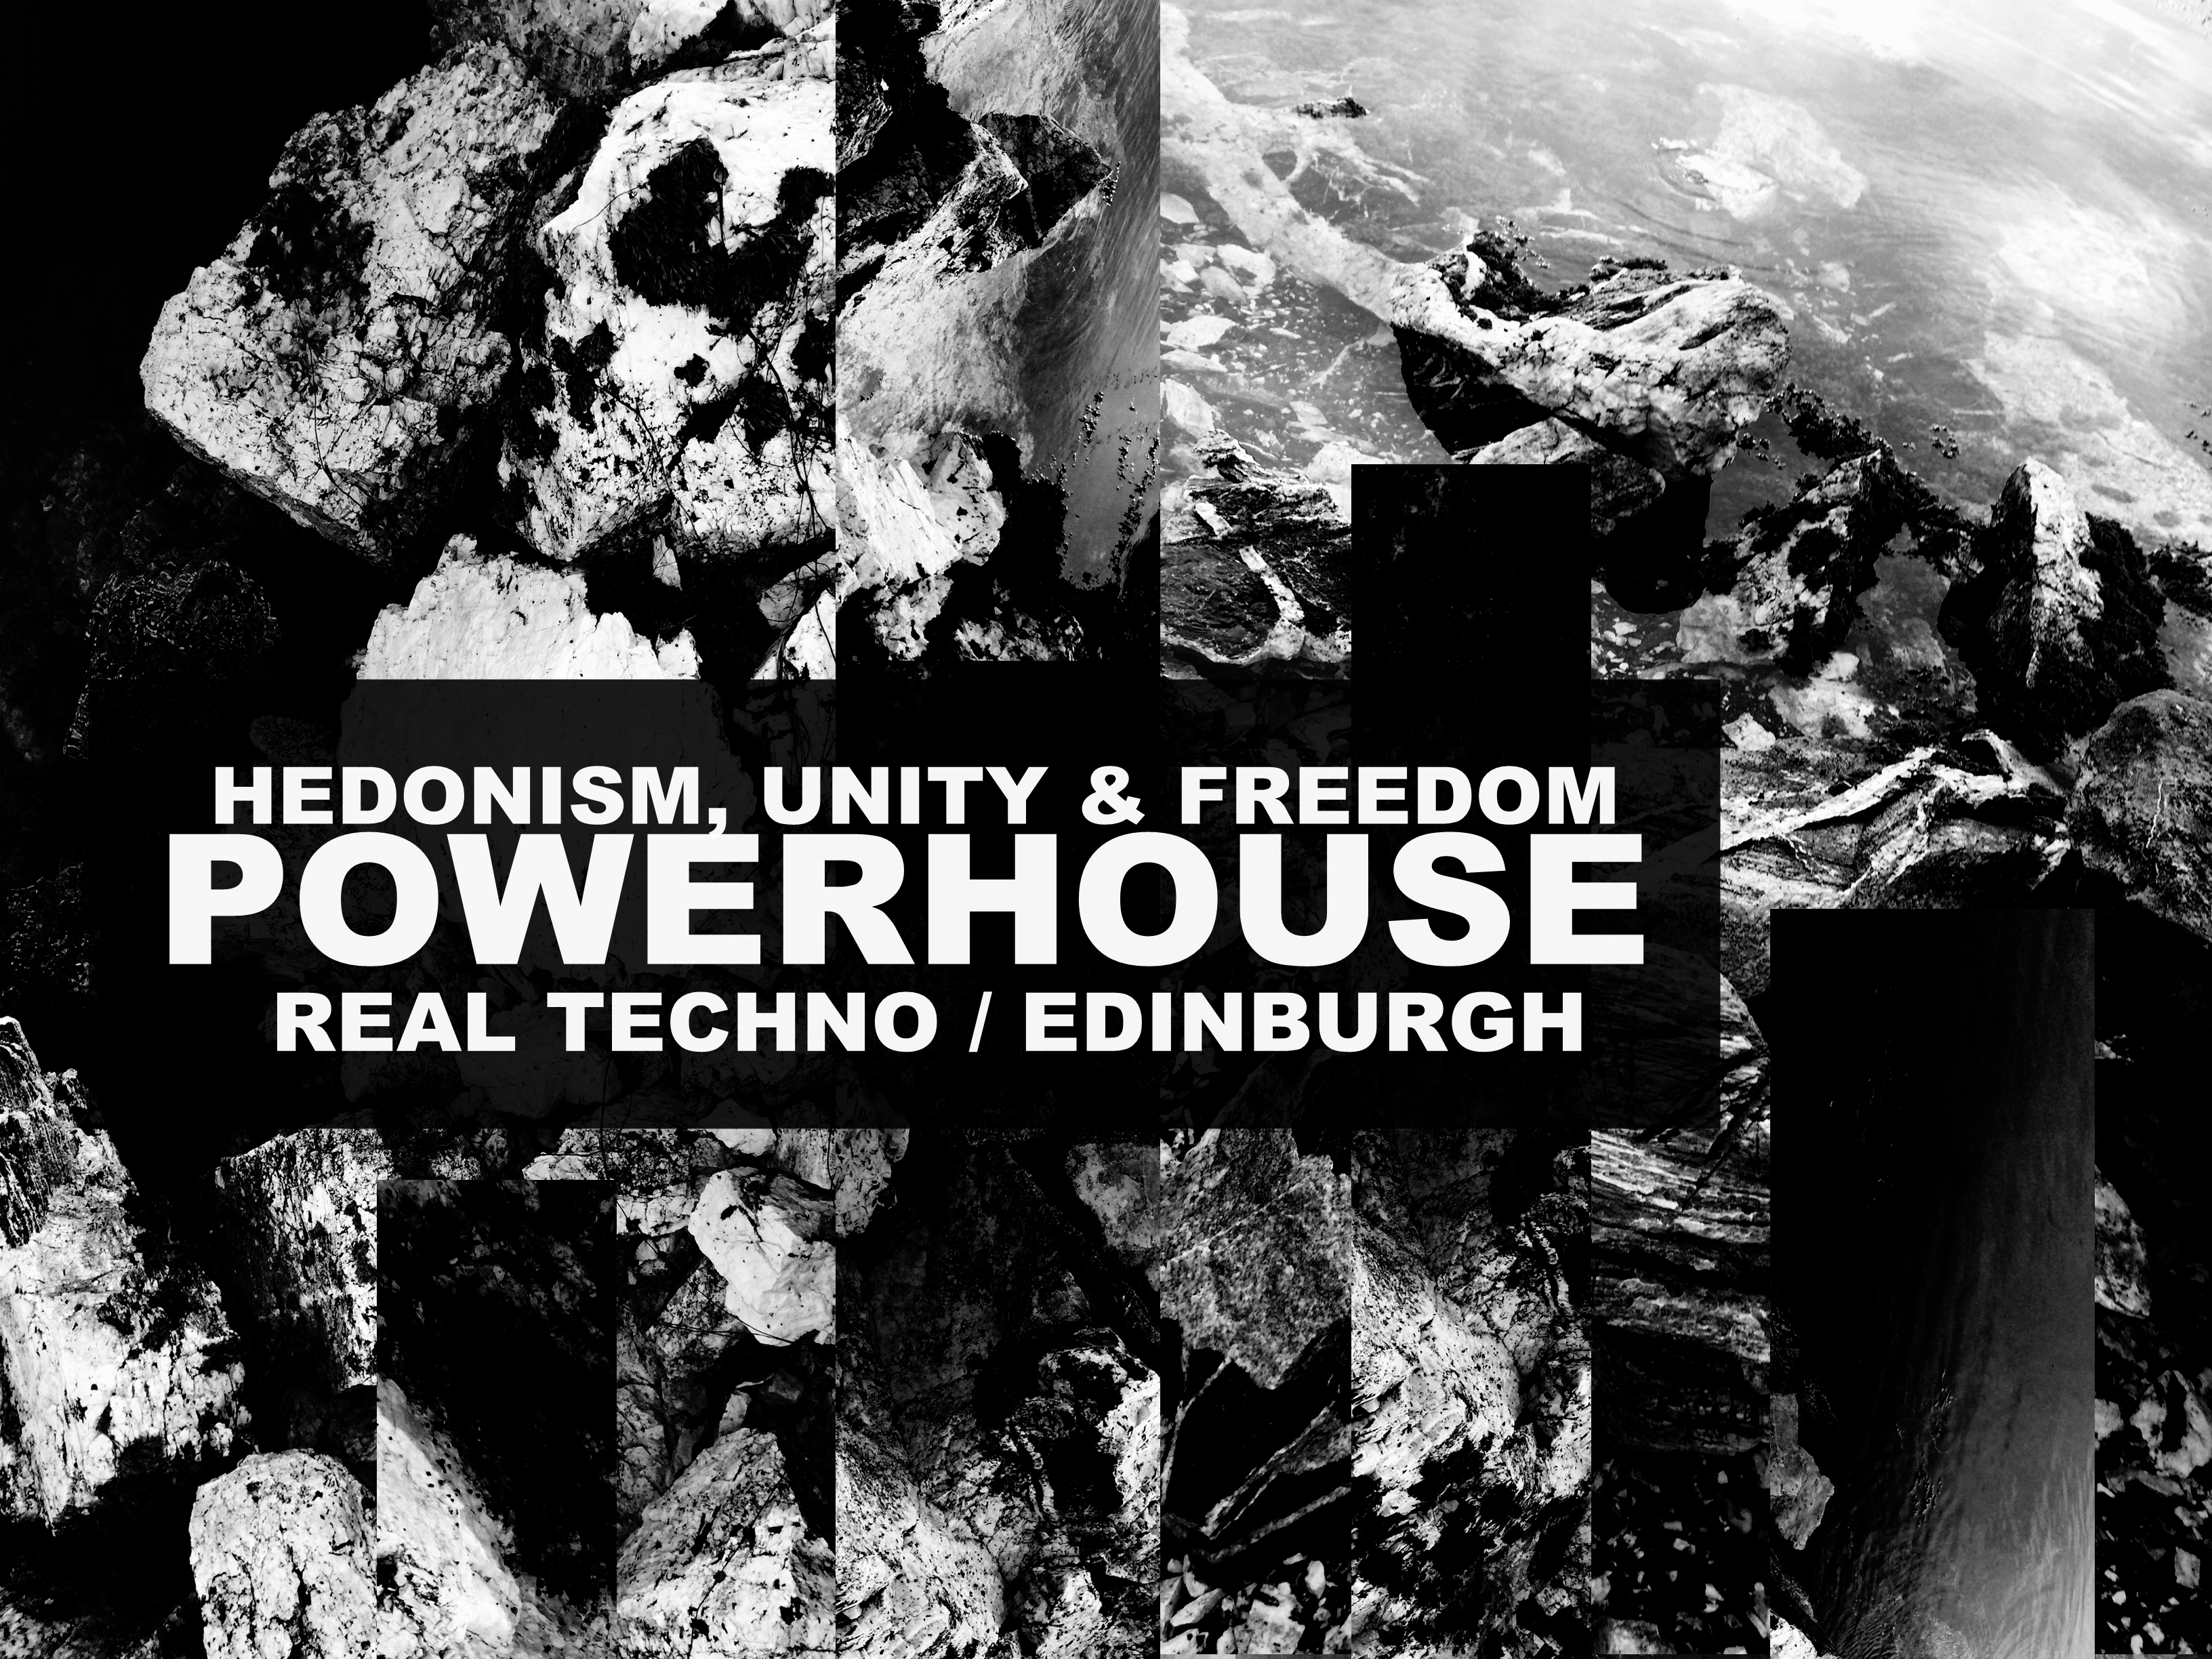 Powerhouse: Hedonism, Unity & Freedom